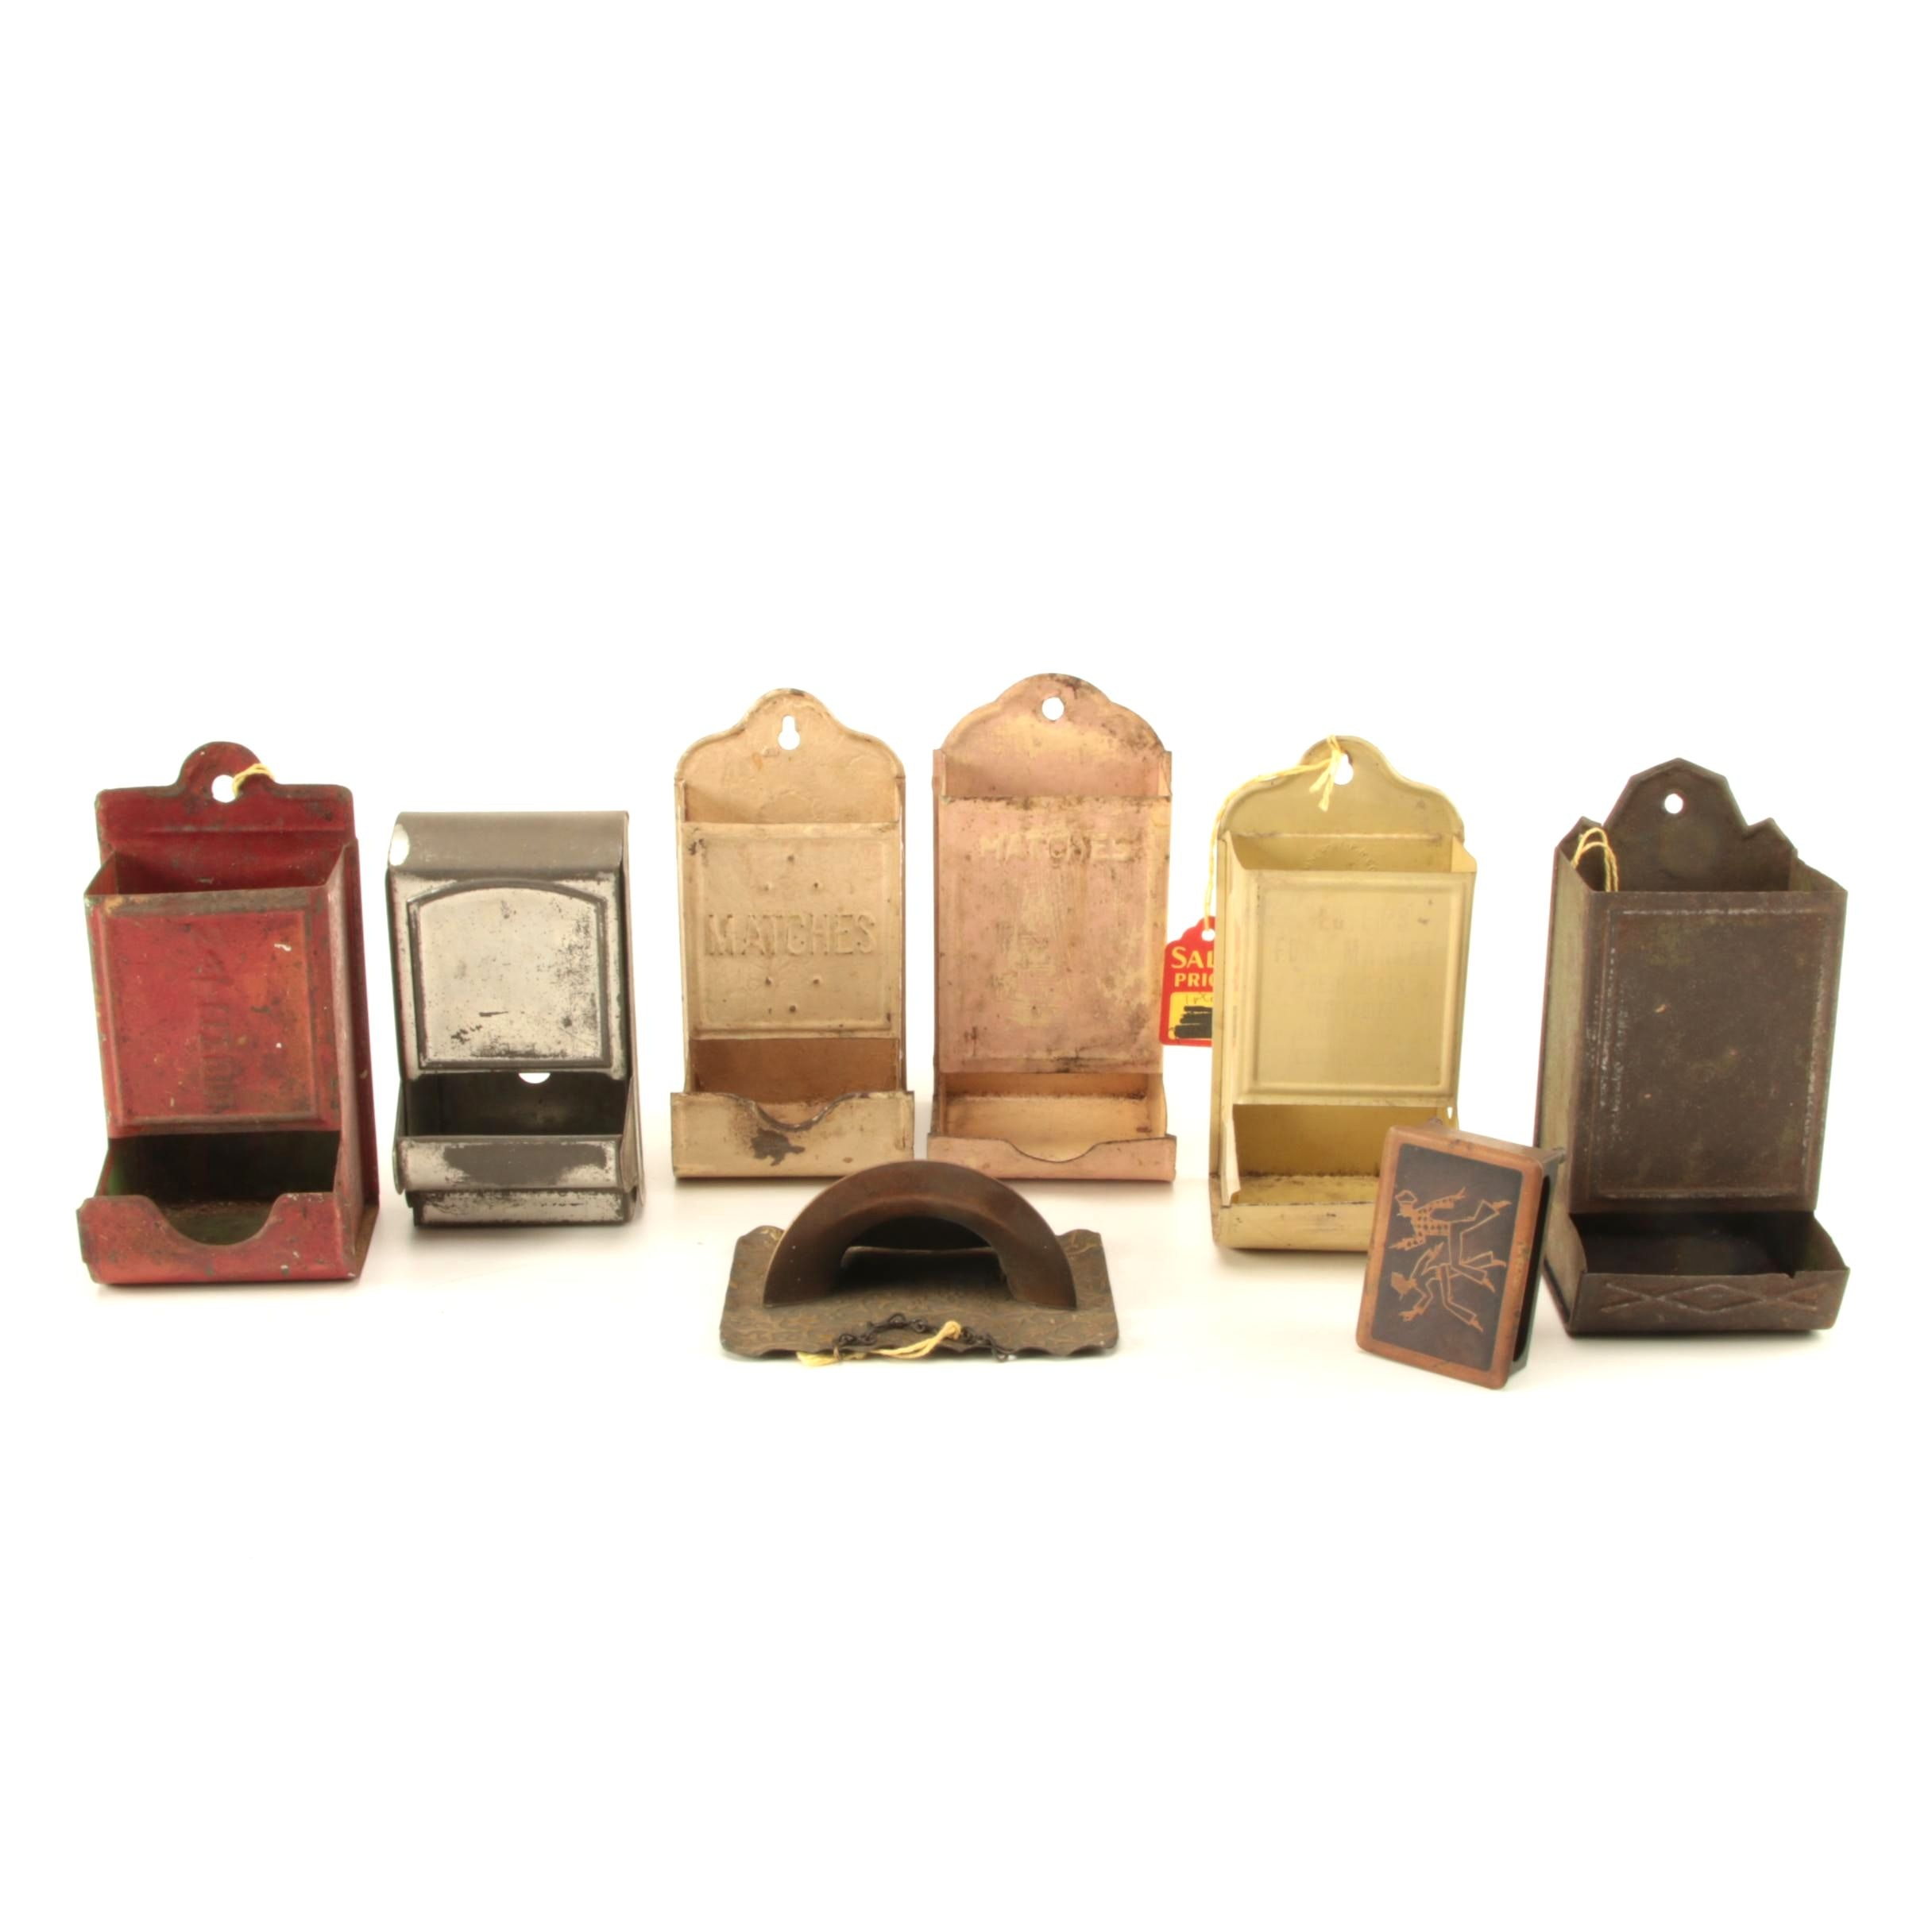 Vintage Metal Match Holders, Wall Pocket and Matchbox